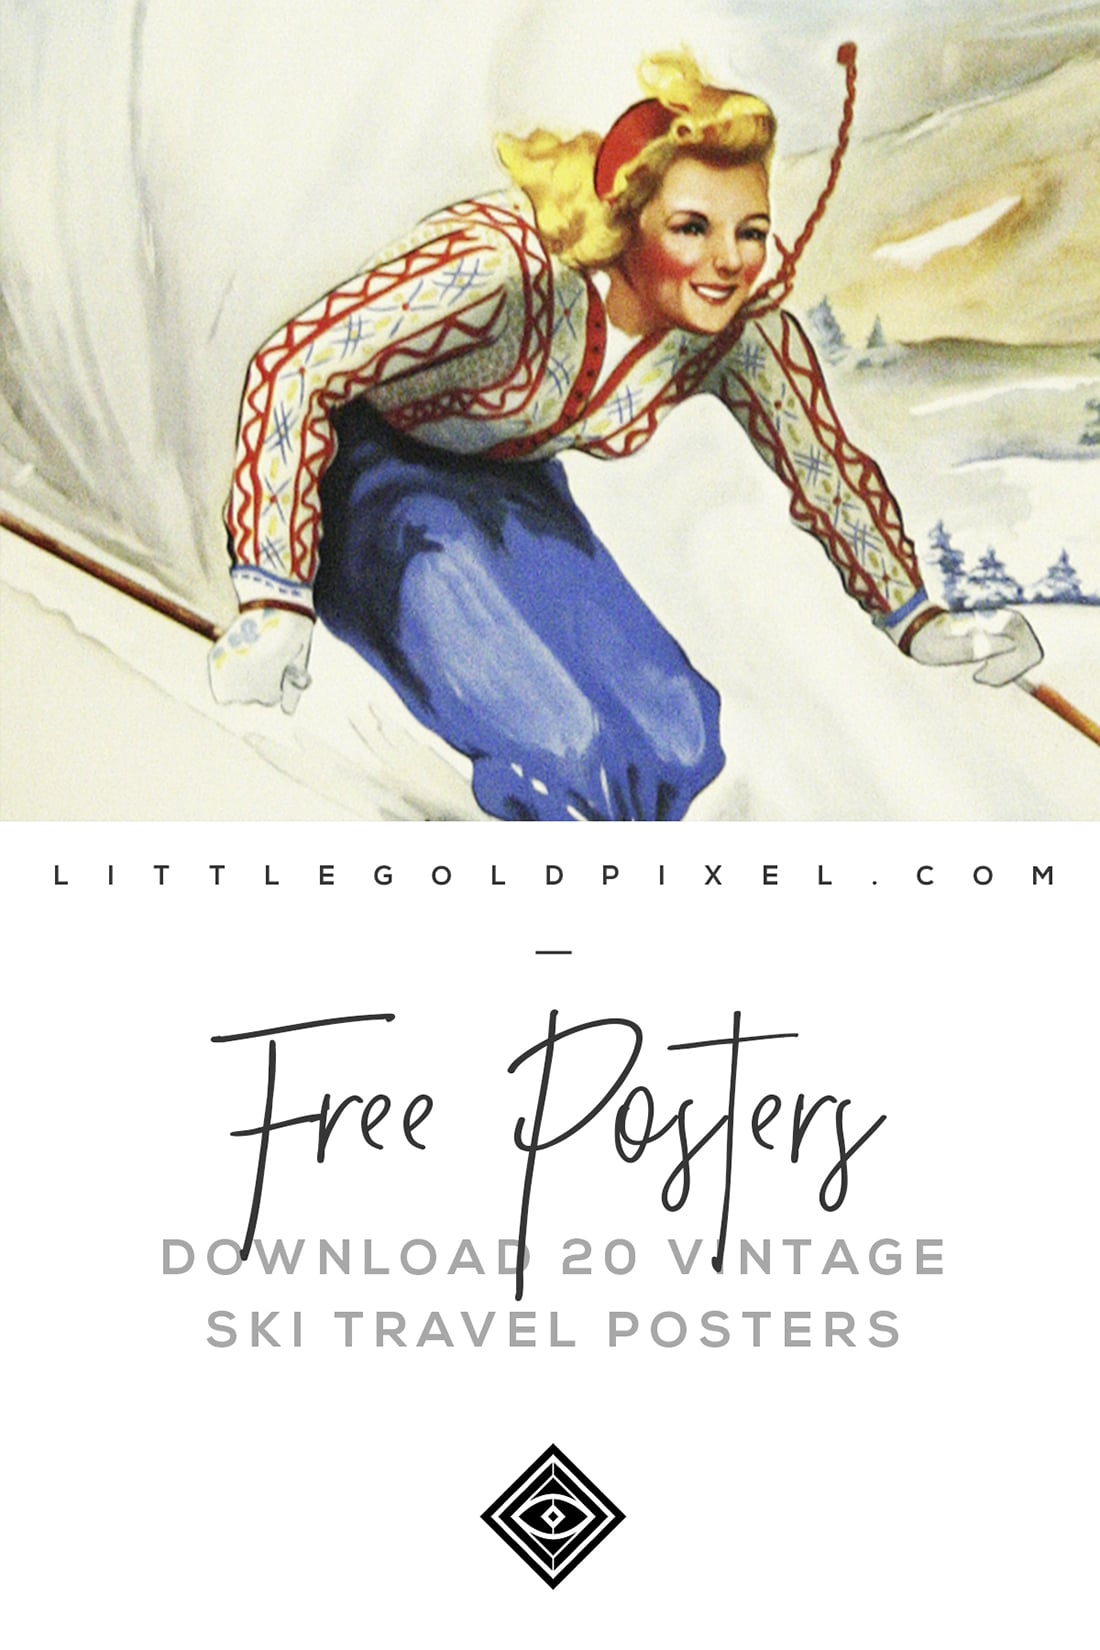 Free Vintage Ski Posters • Little Gold Pixel